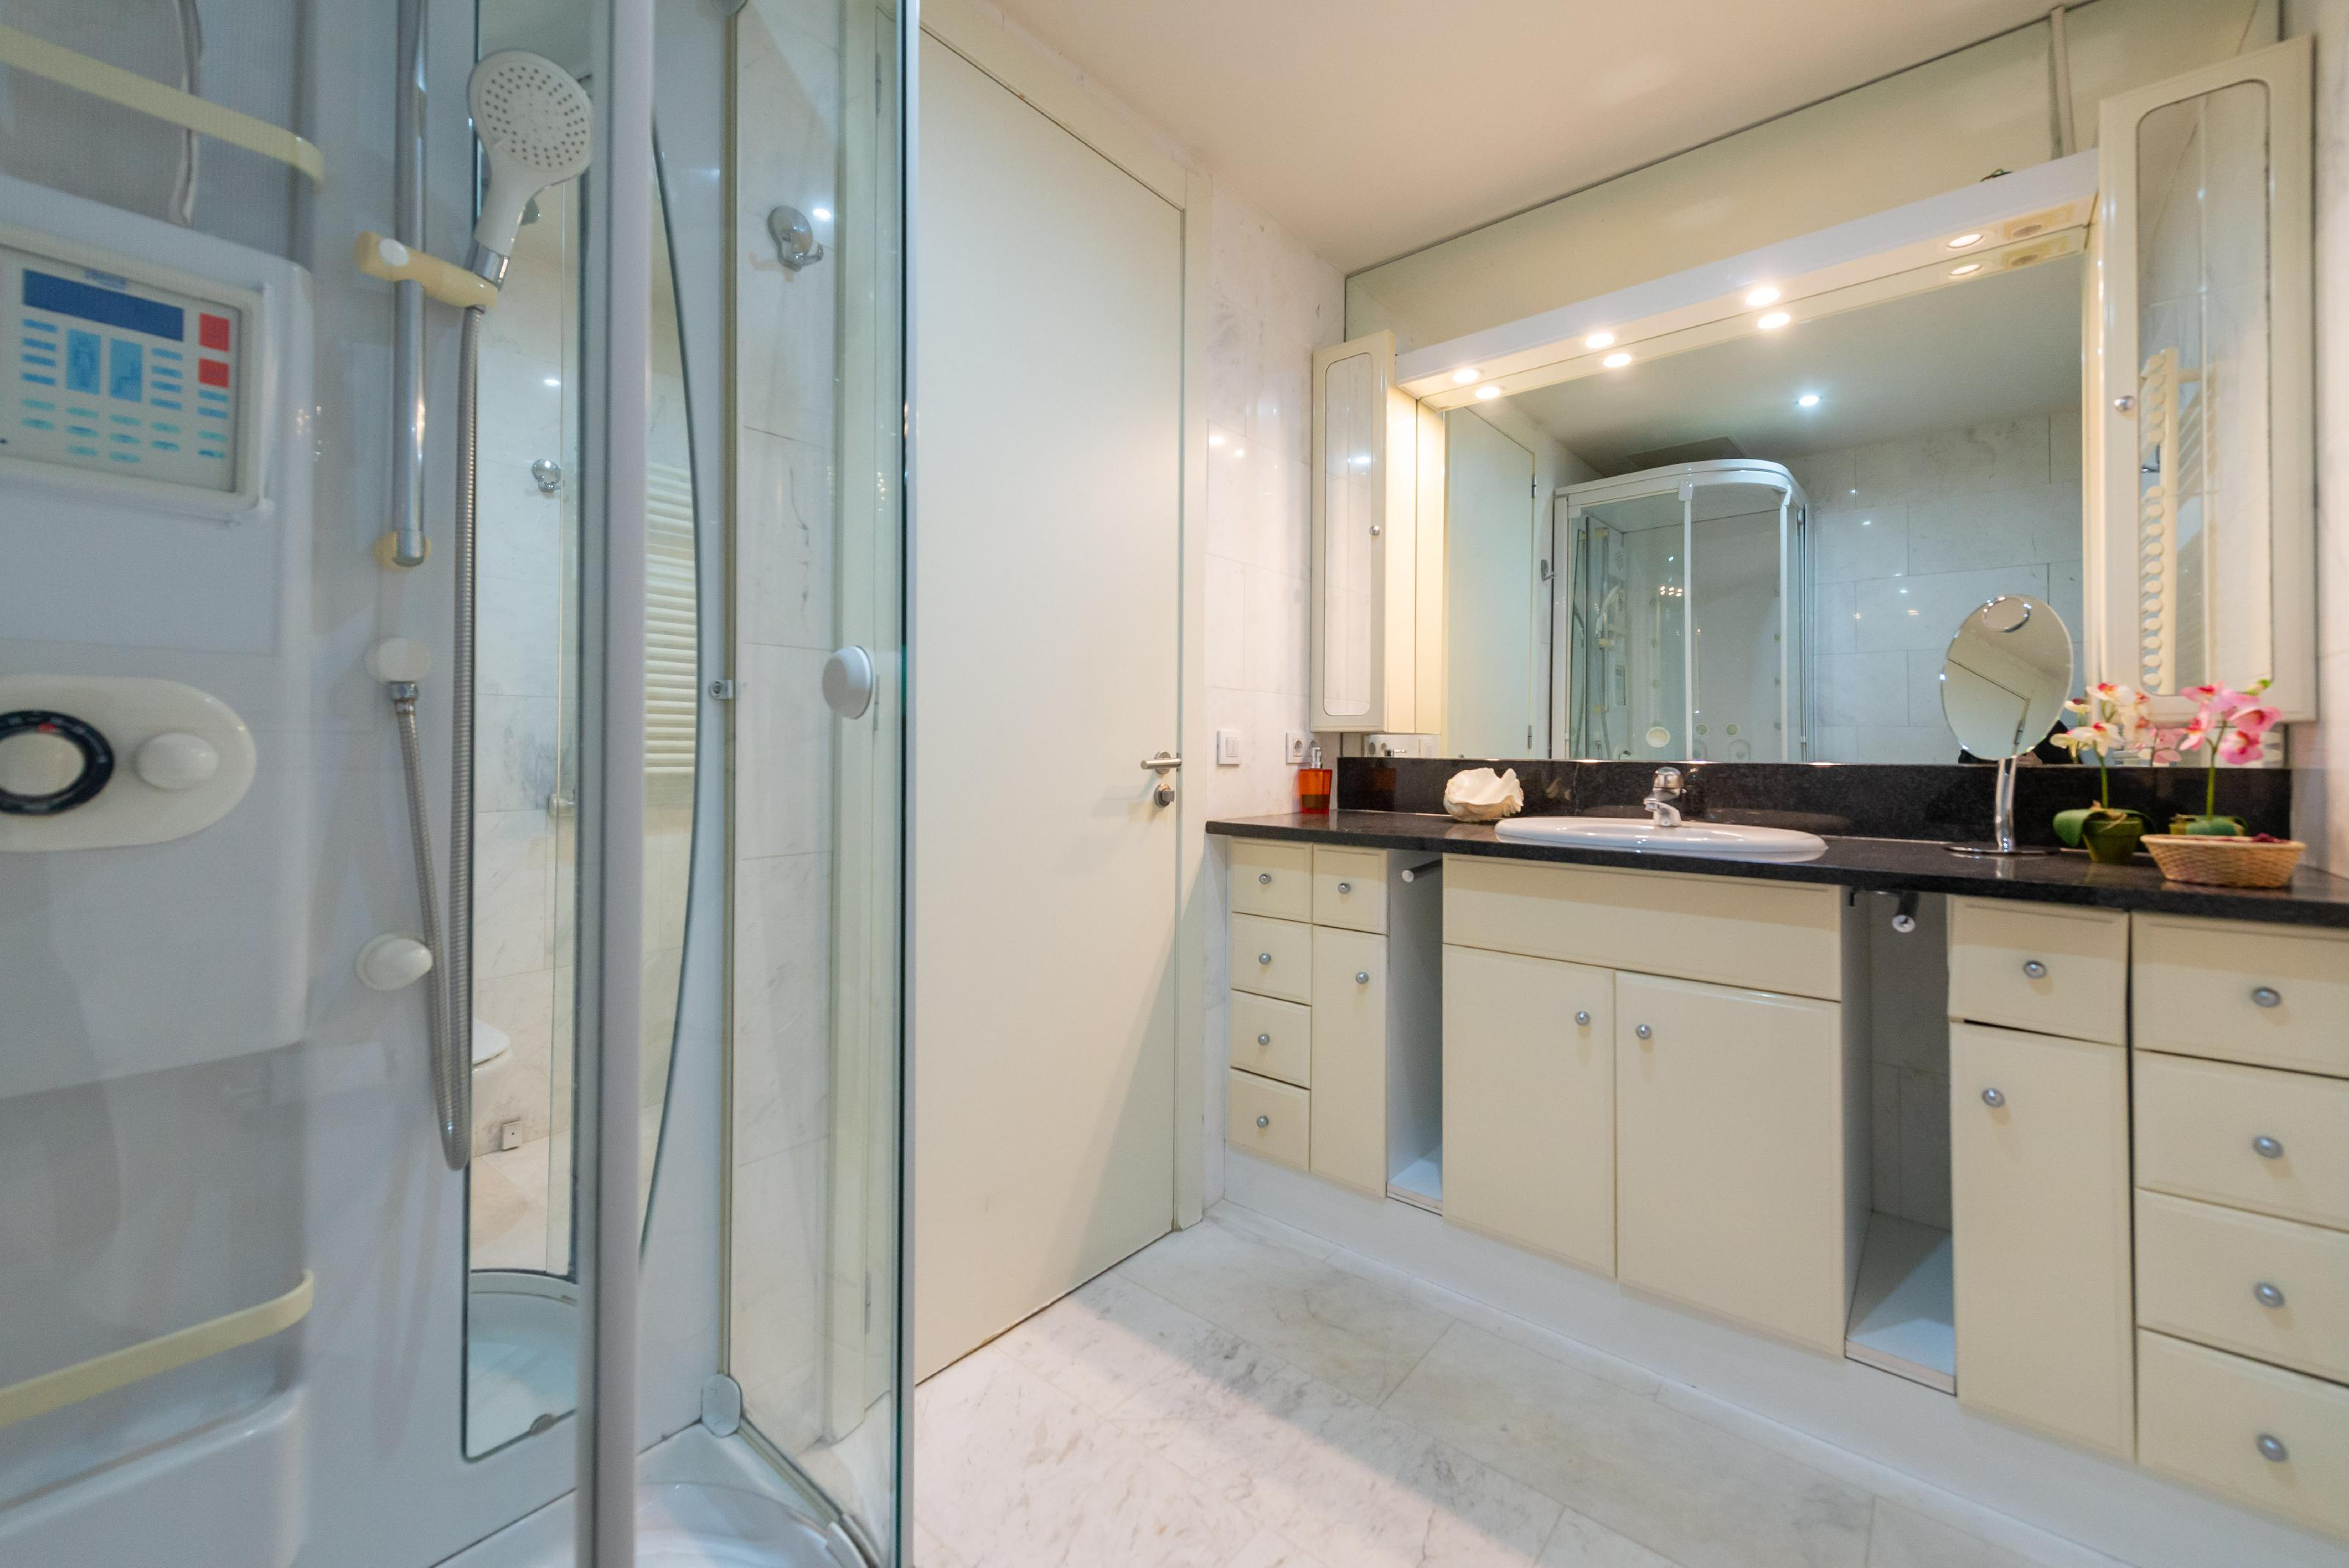 246281 Flat for sale in Sarrià-Sant Gervasi, Tres Torres 18